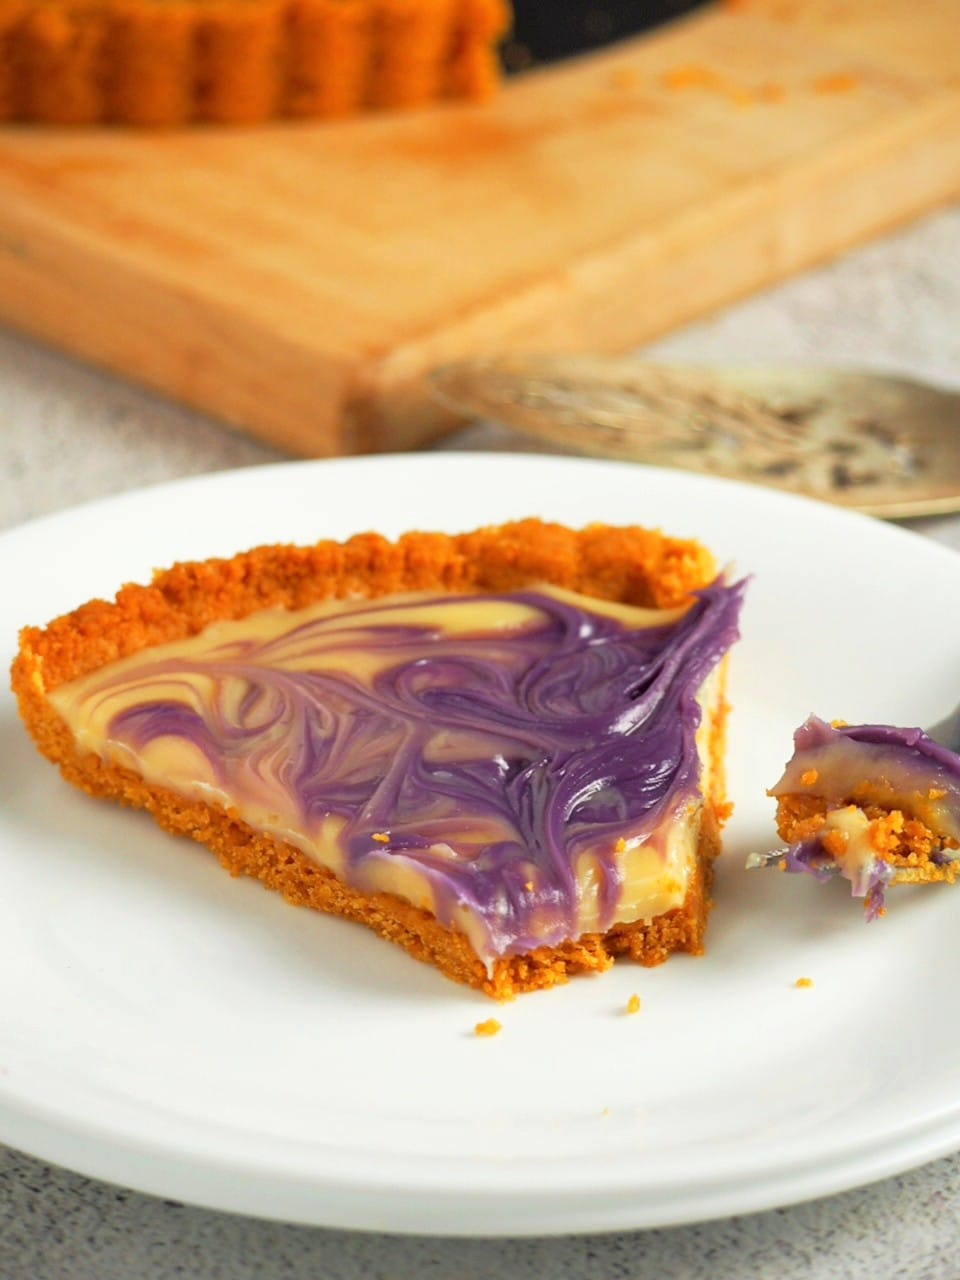 The served ube custard pie.